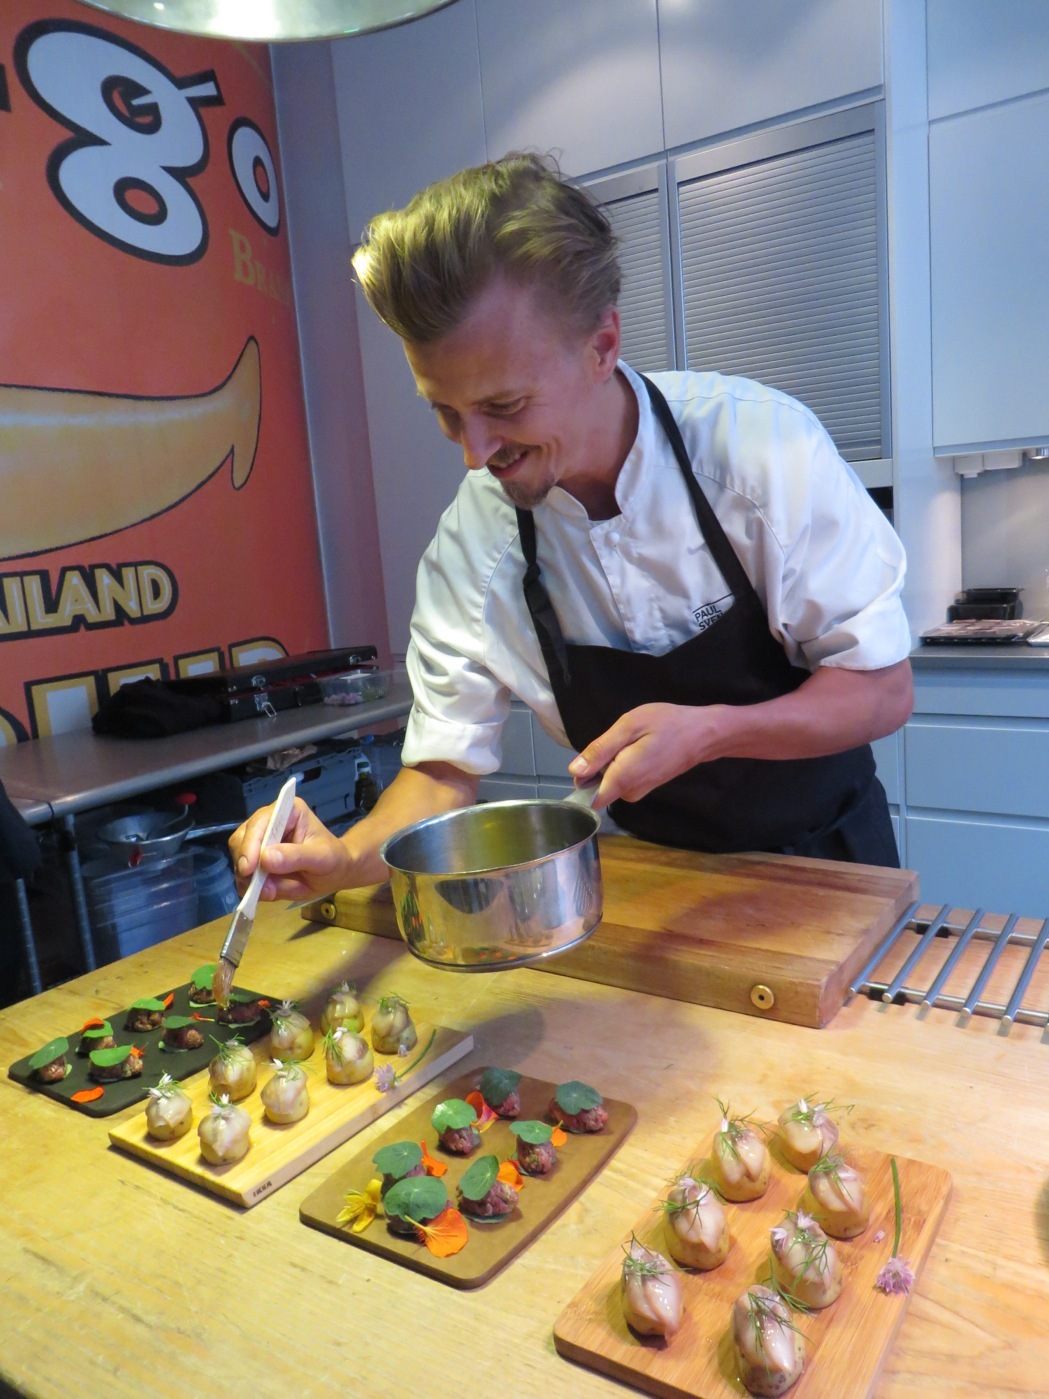 Paul Svensson in action